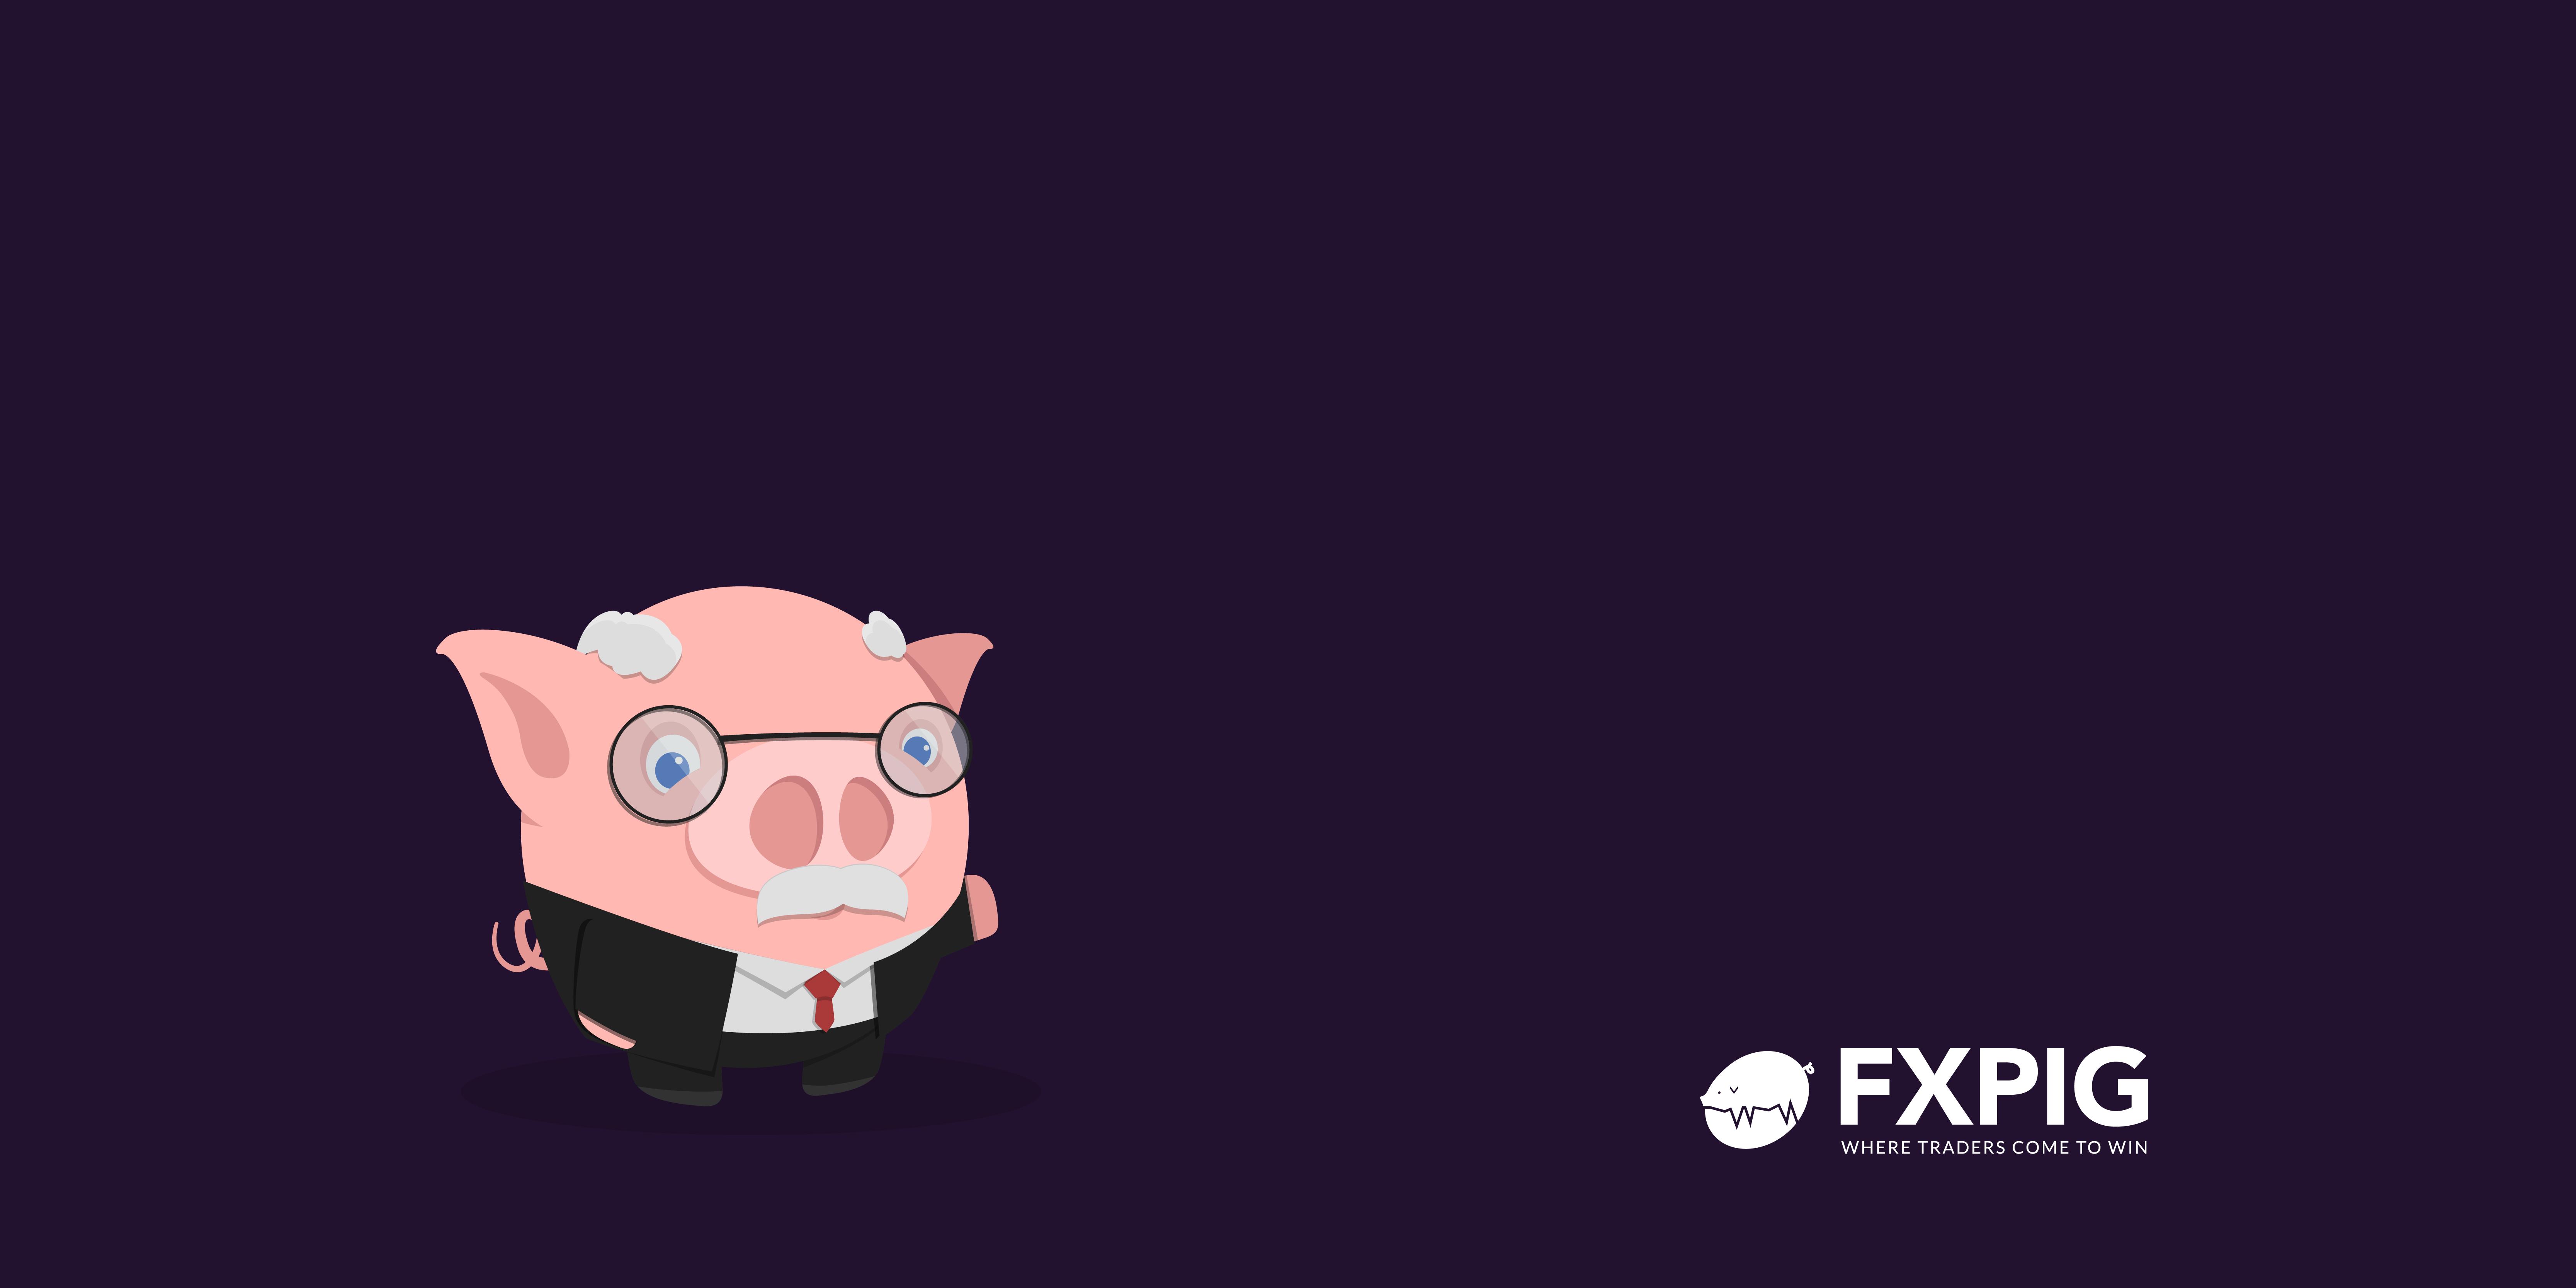 FOREX_Trading-quote-piginsider-0605_FXPIG